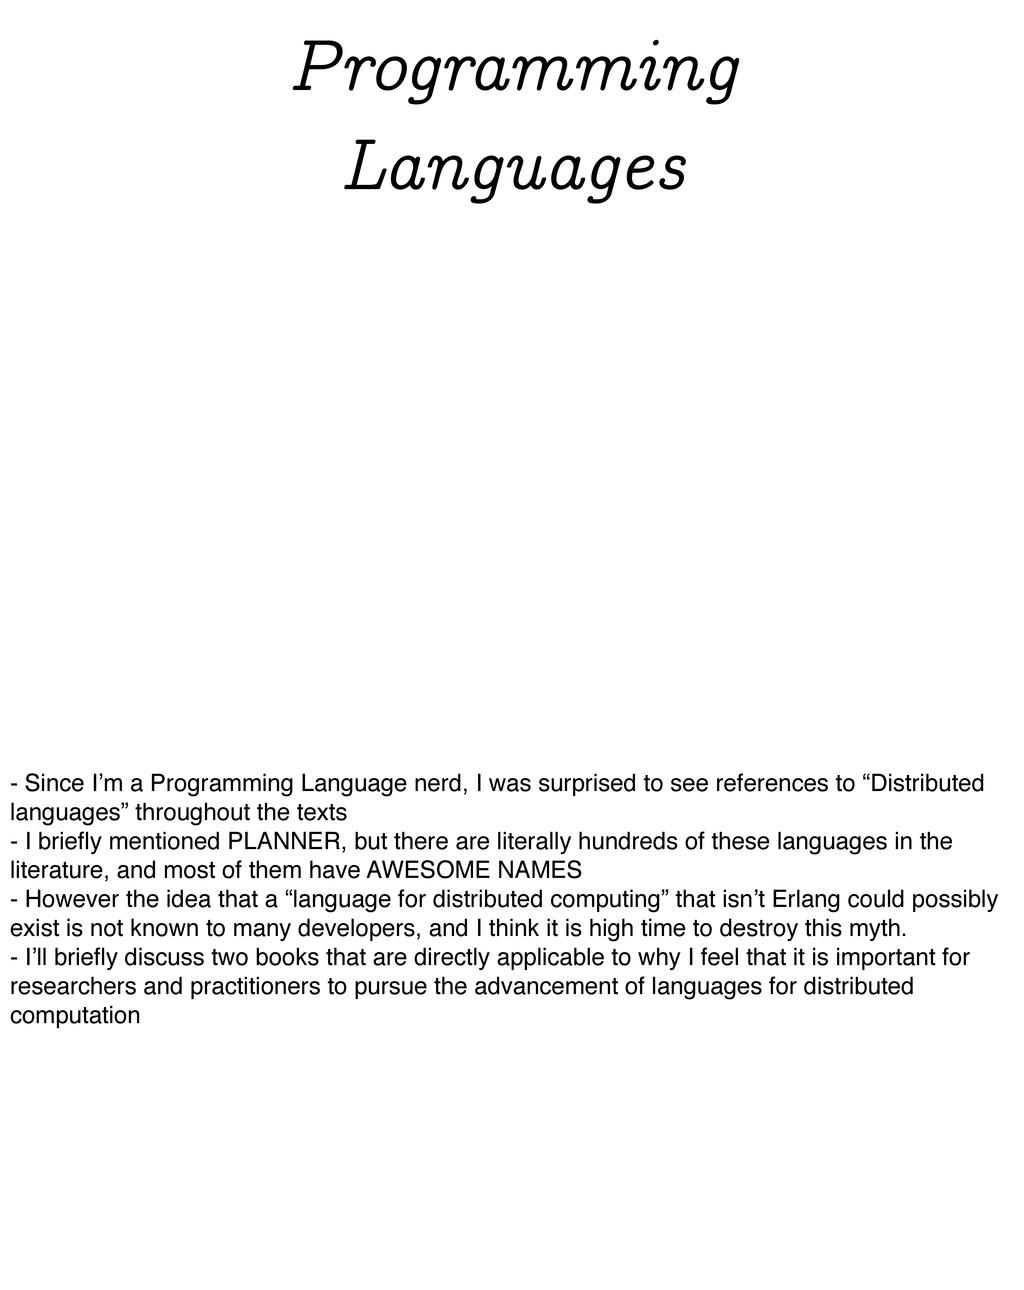 Programming Languages - Since I'm a Programming...